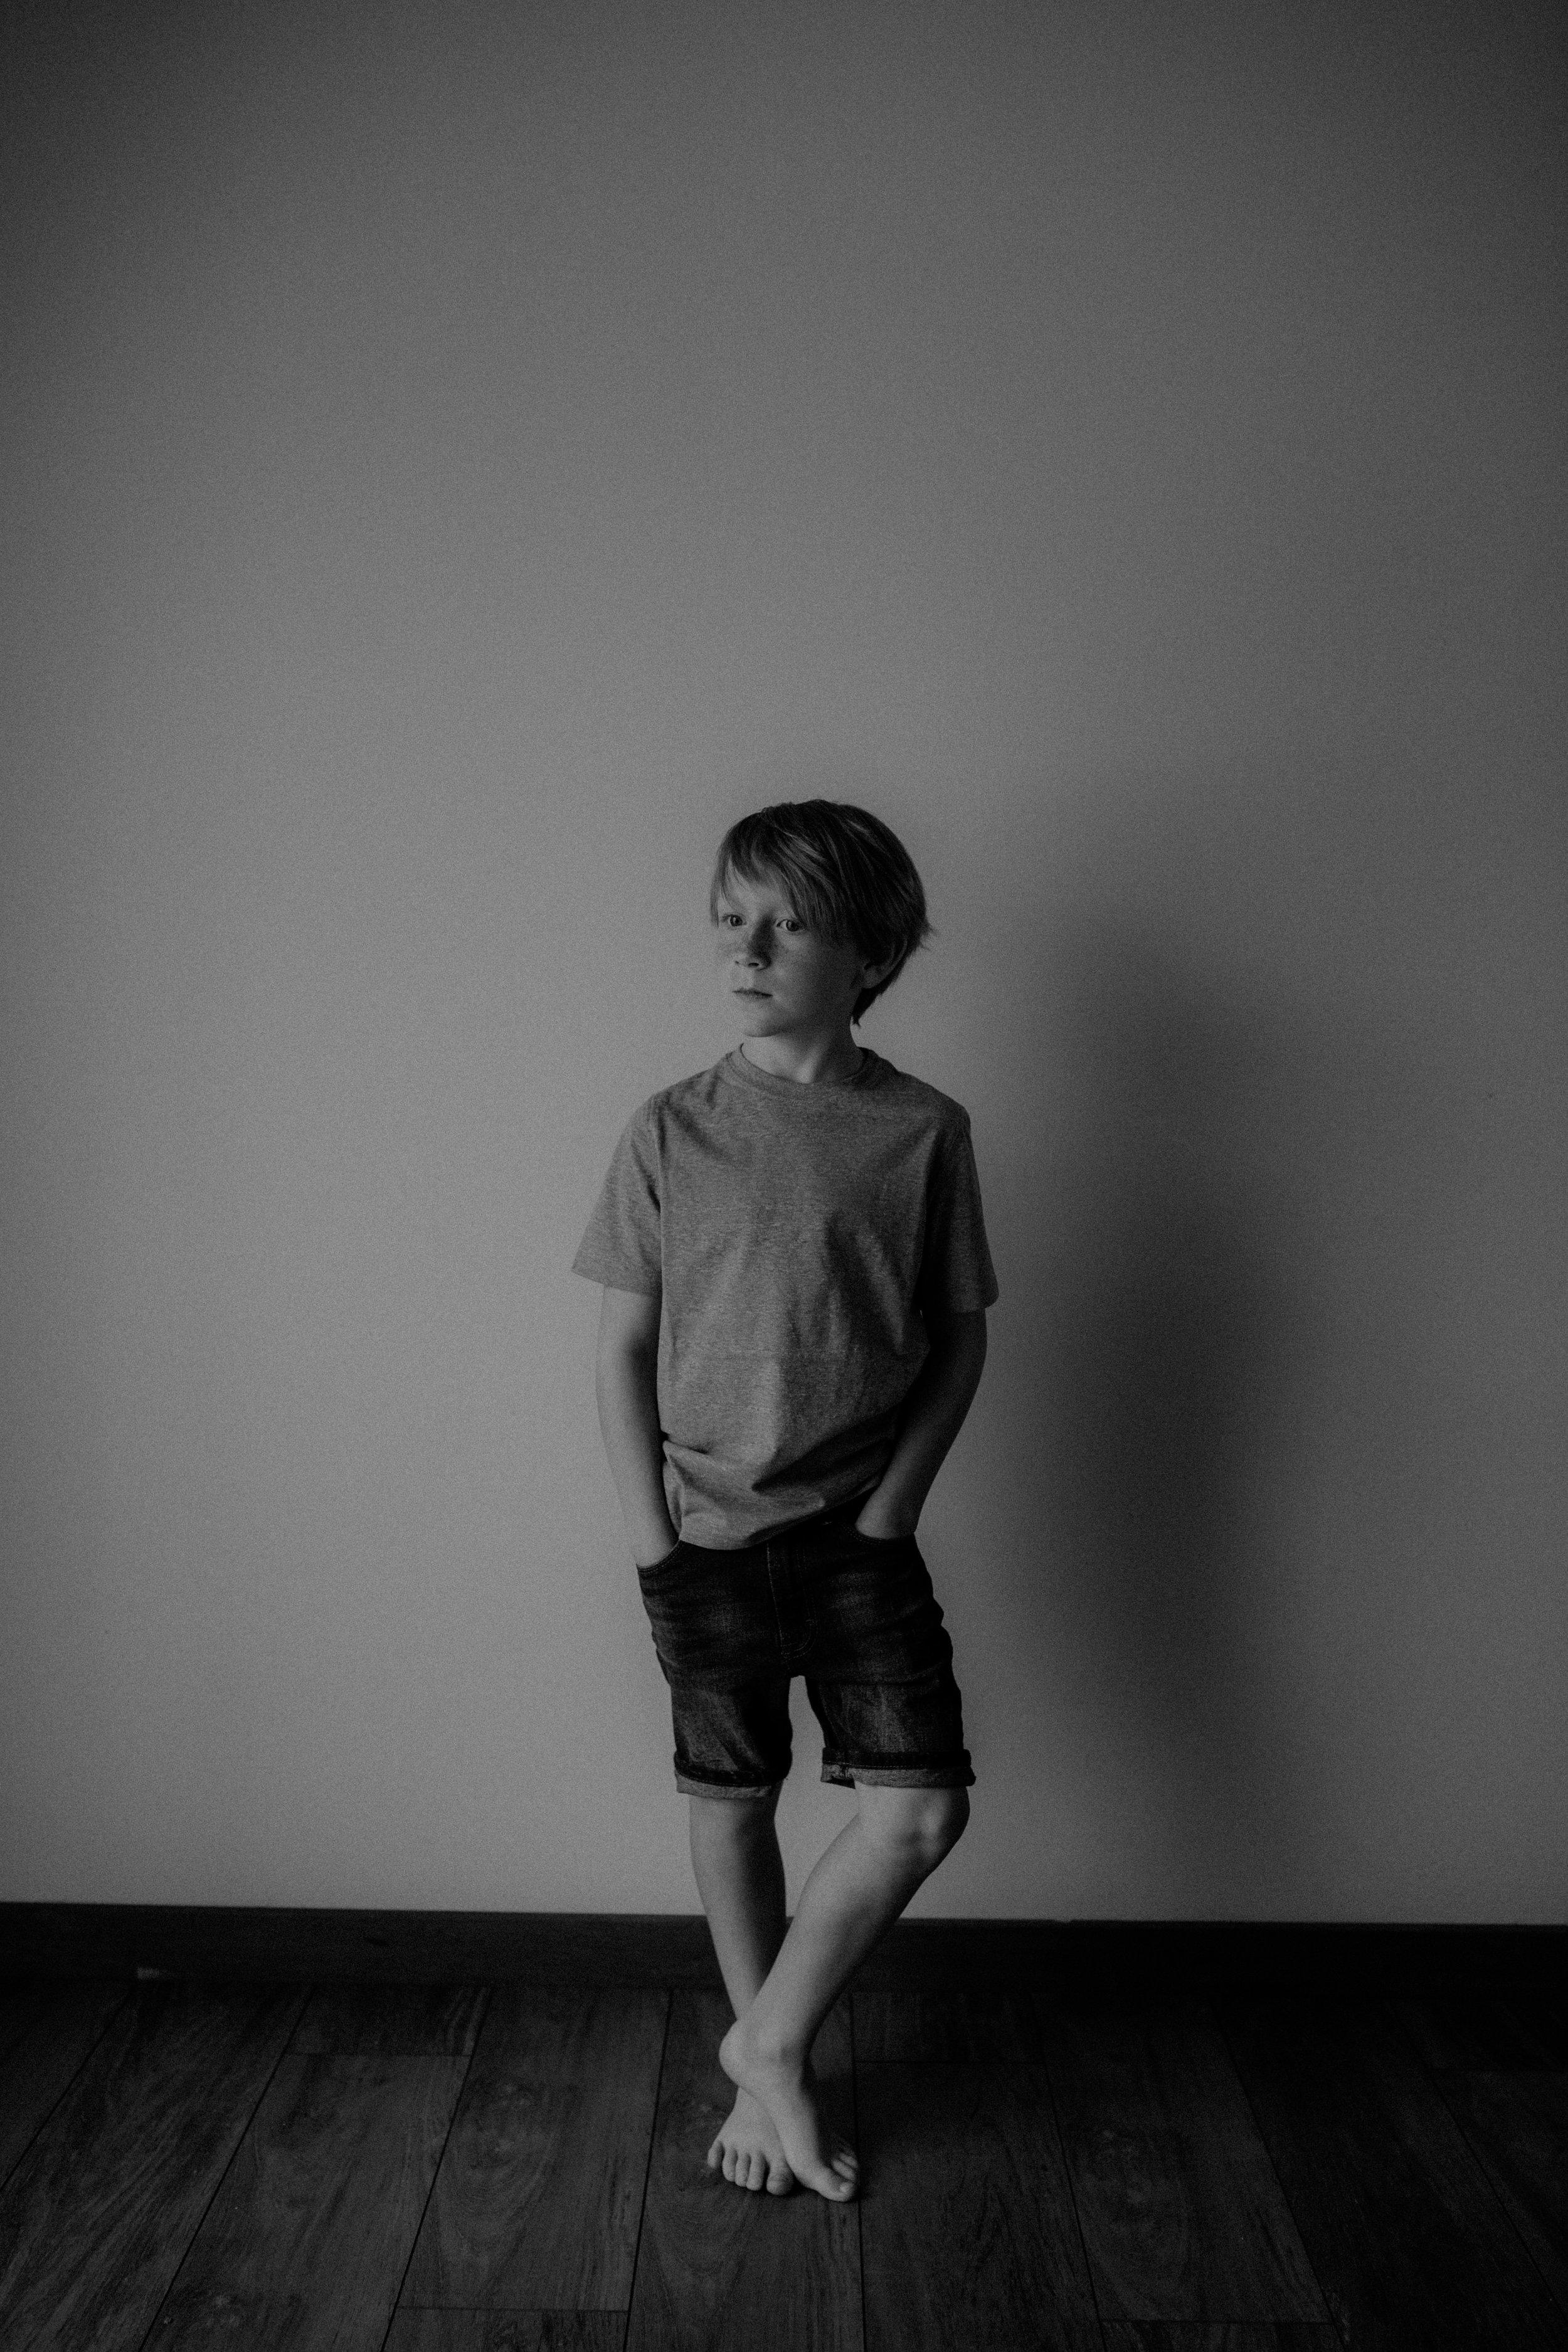 motherhood-self-portrait-37.jpg